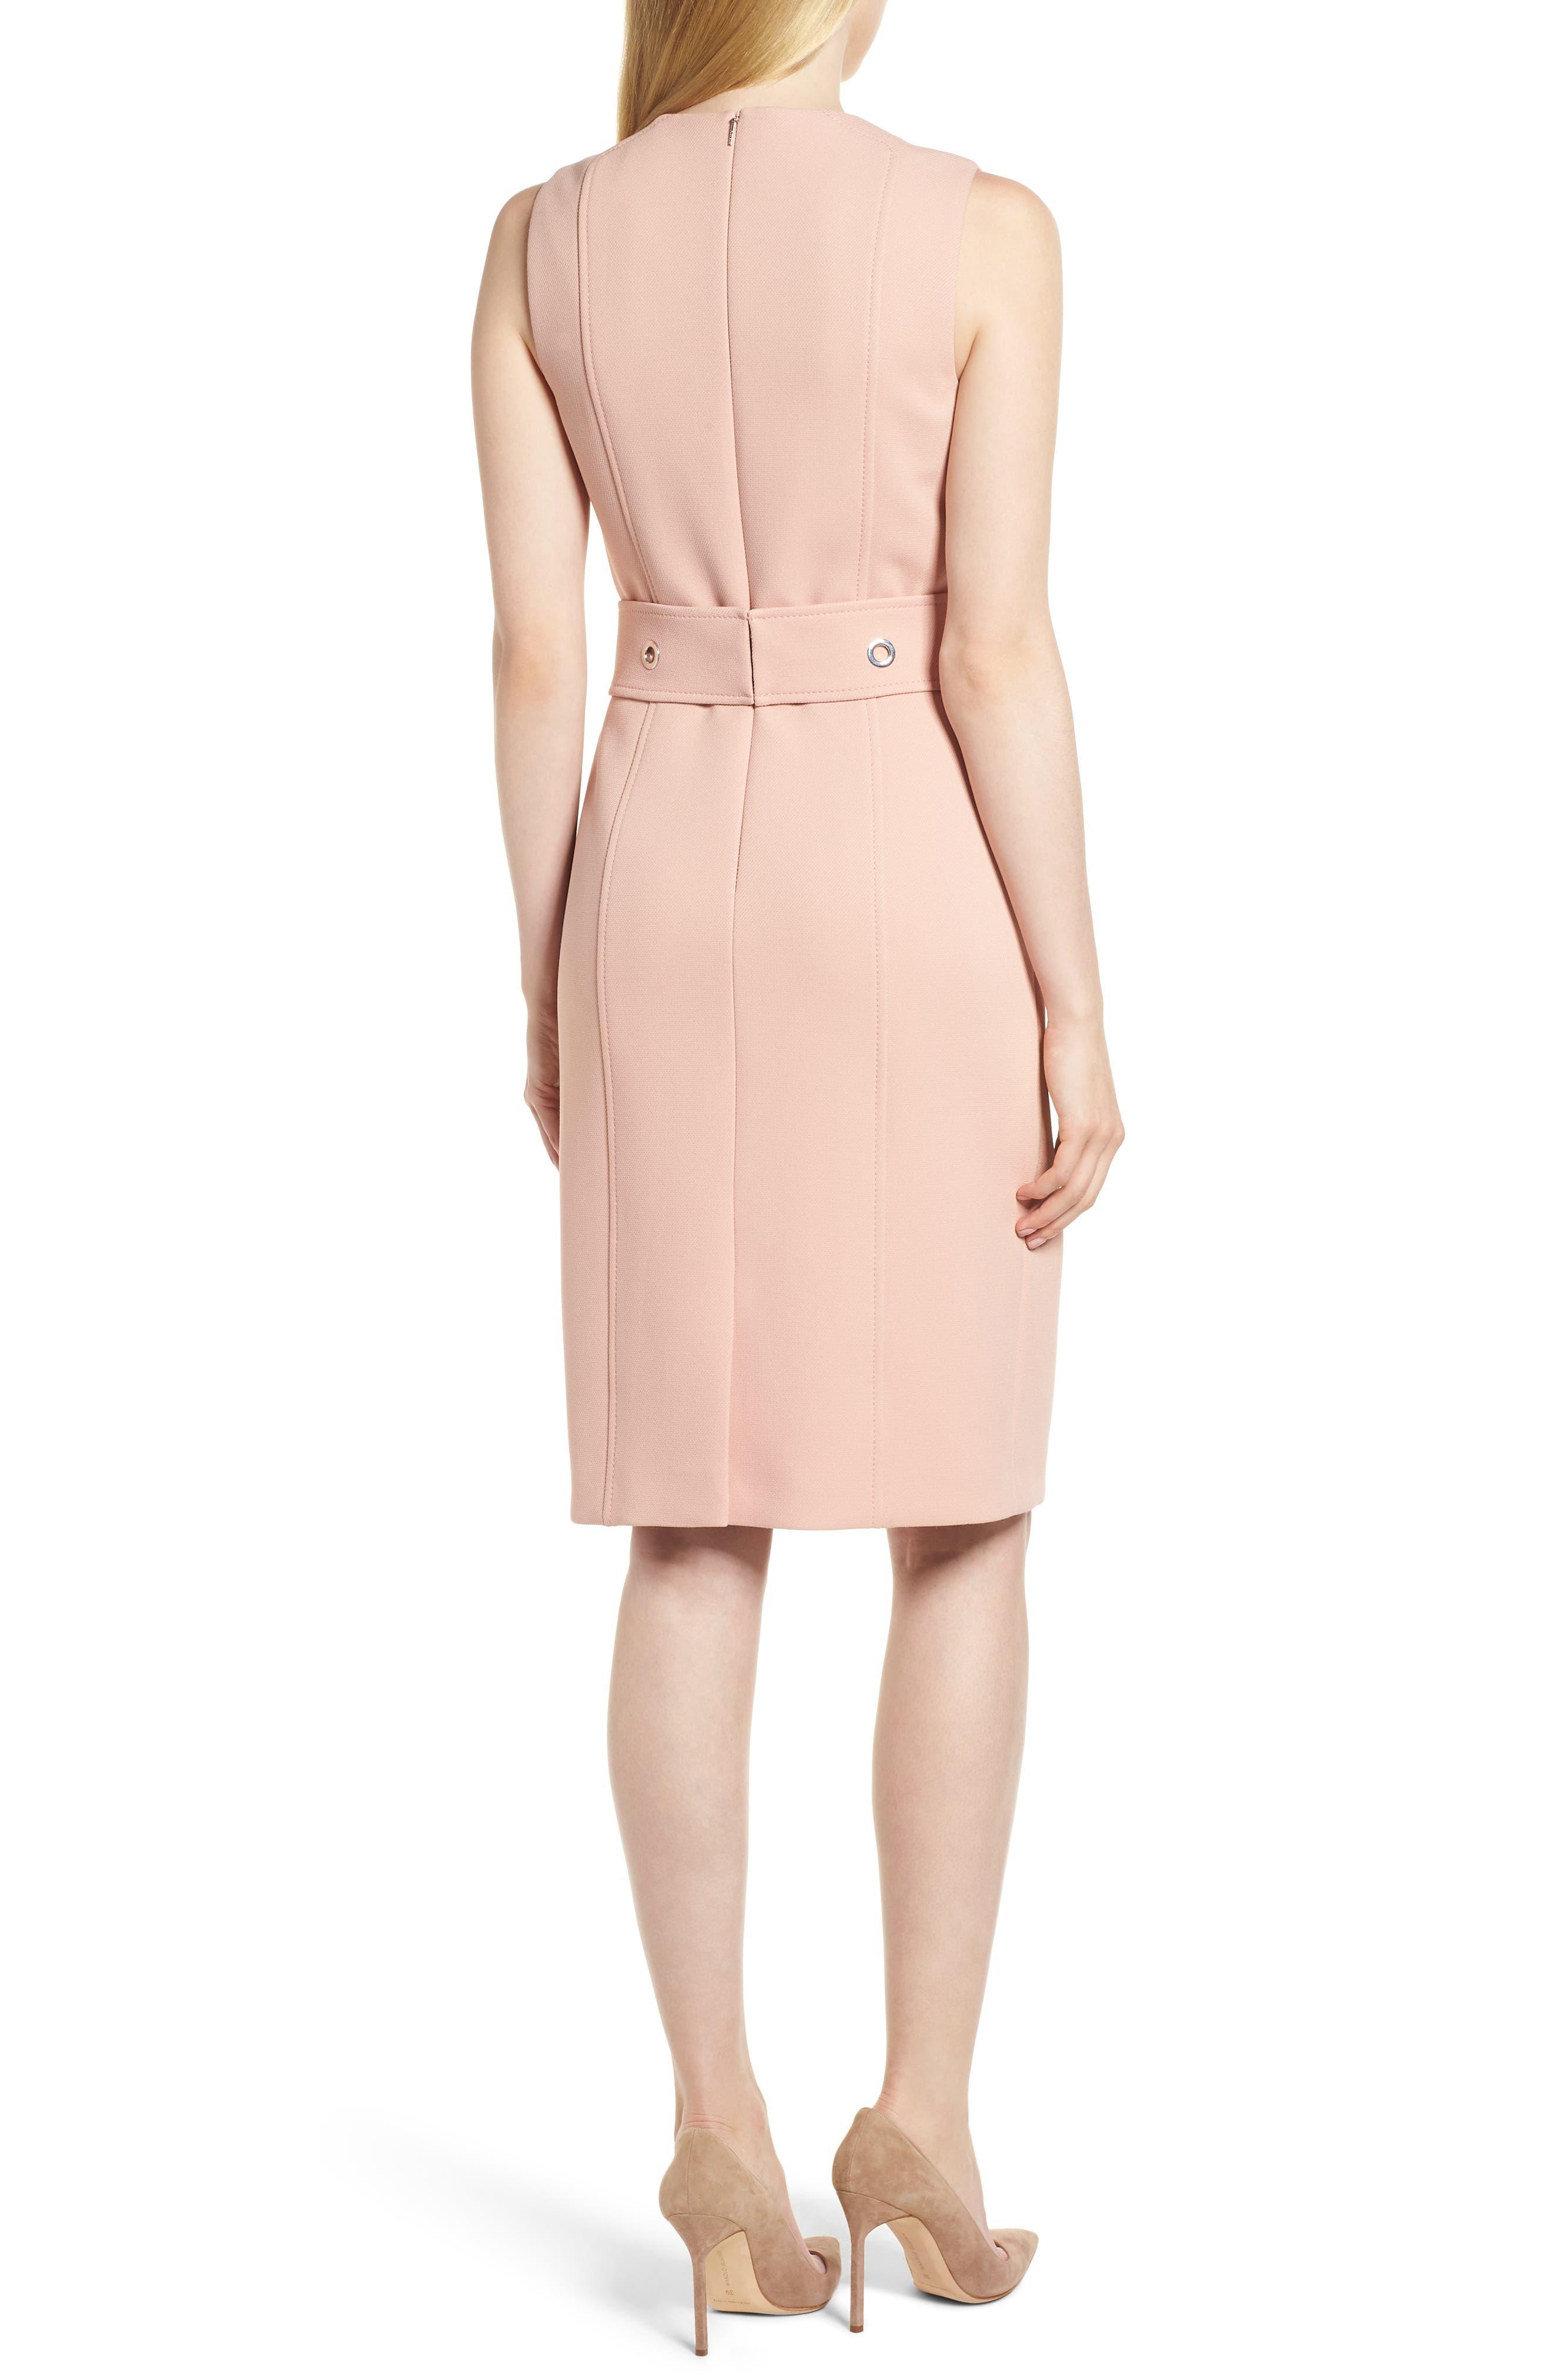 Duleama Compact Twill Dress,                             Alternate thumbnail 2, color,                             Blush